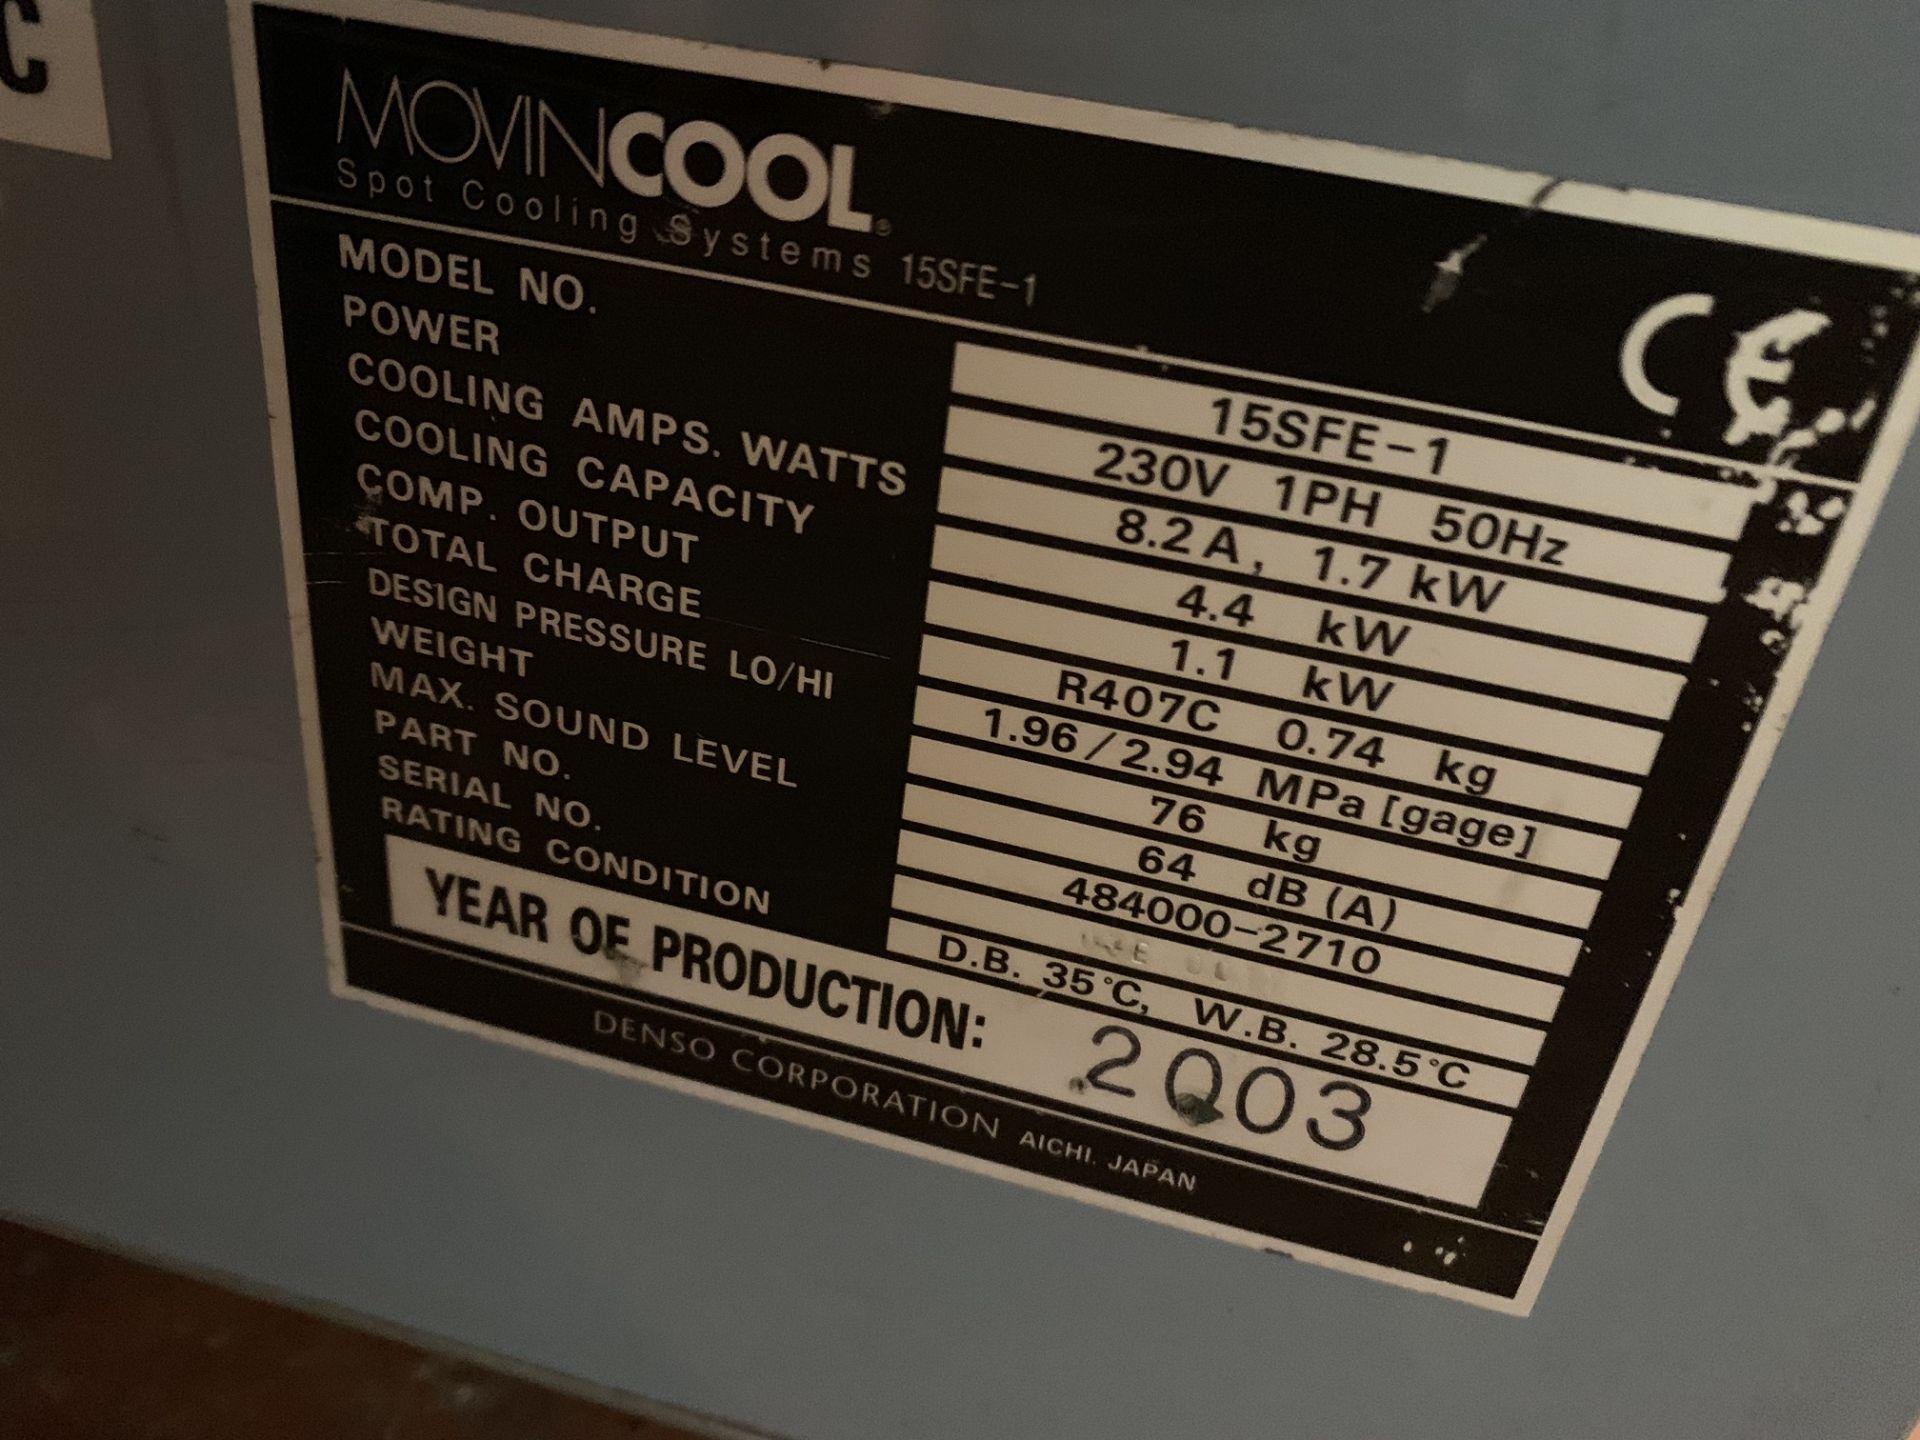 Lot 7 - MOVINCOOL AIR COOLER MODEL 15SFE-1